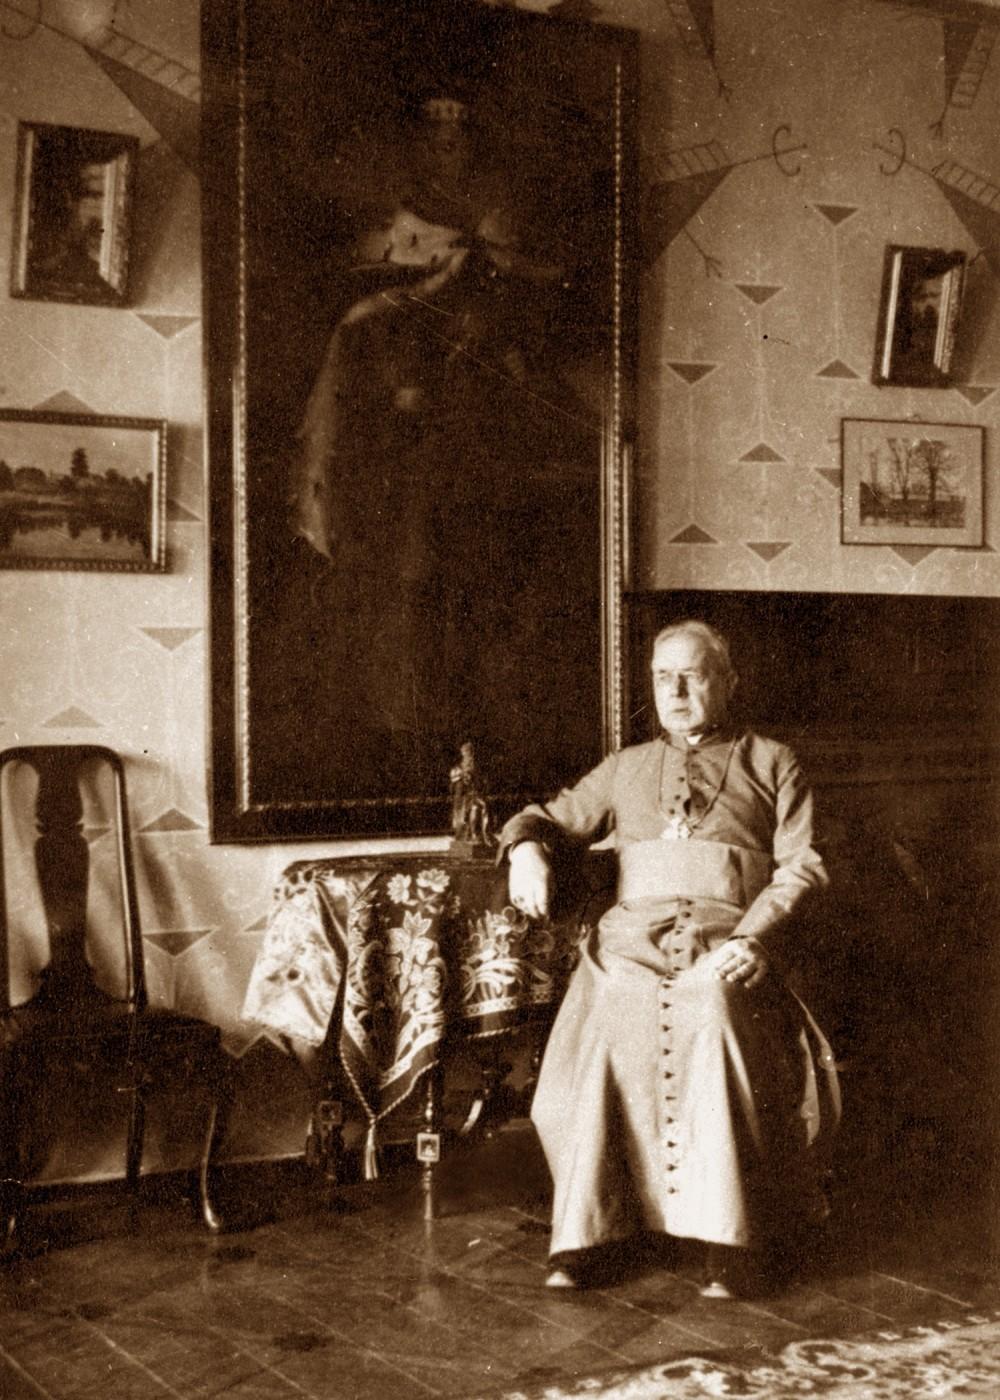 Maironis darbo kabinete. 1931 m. | Maironis in the study. 1931